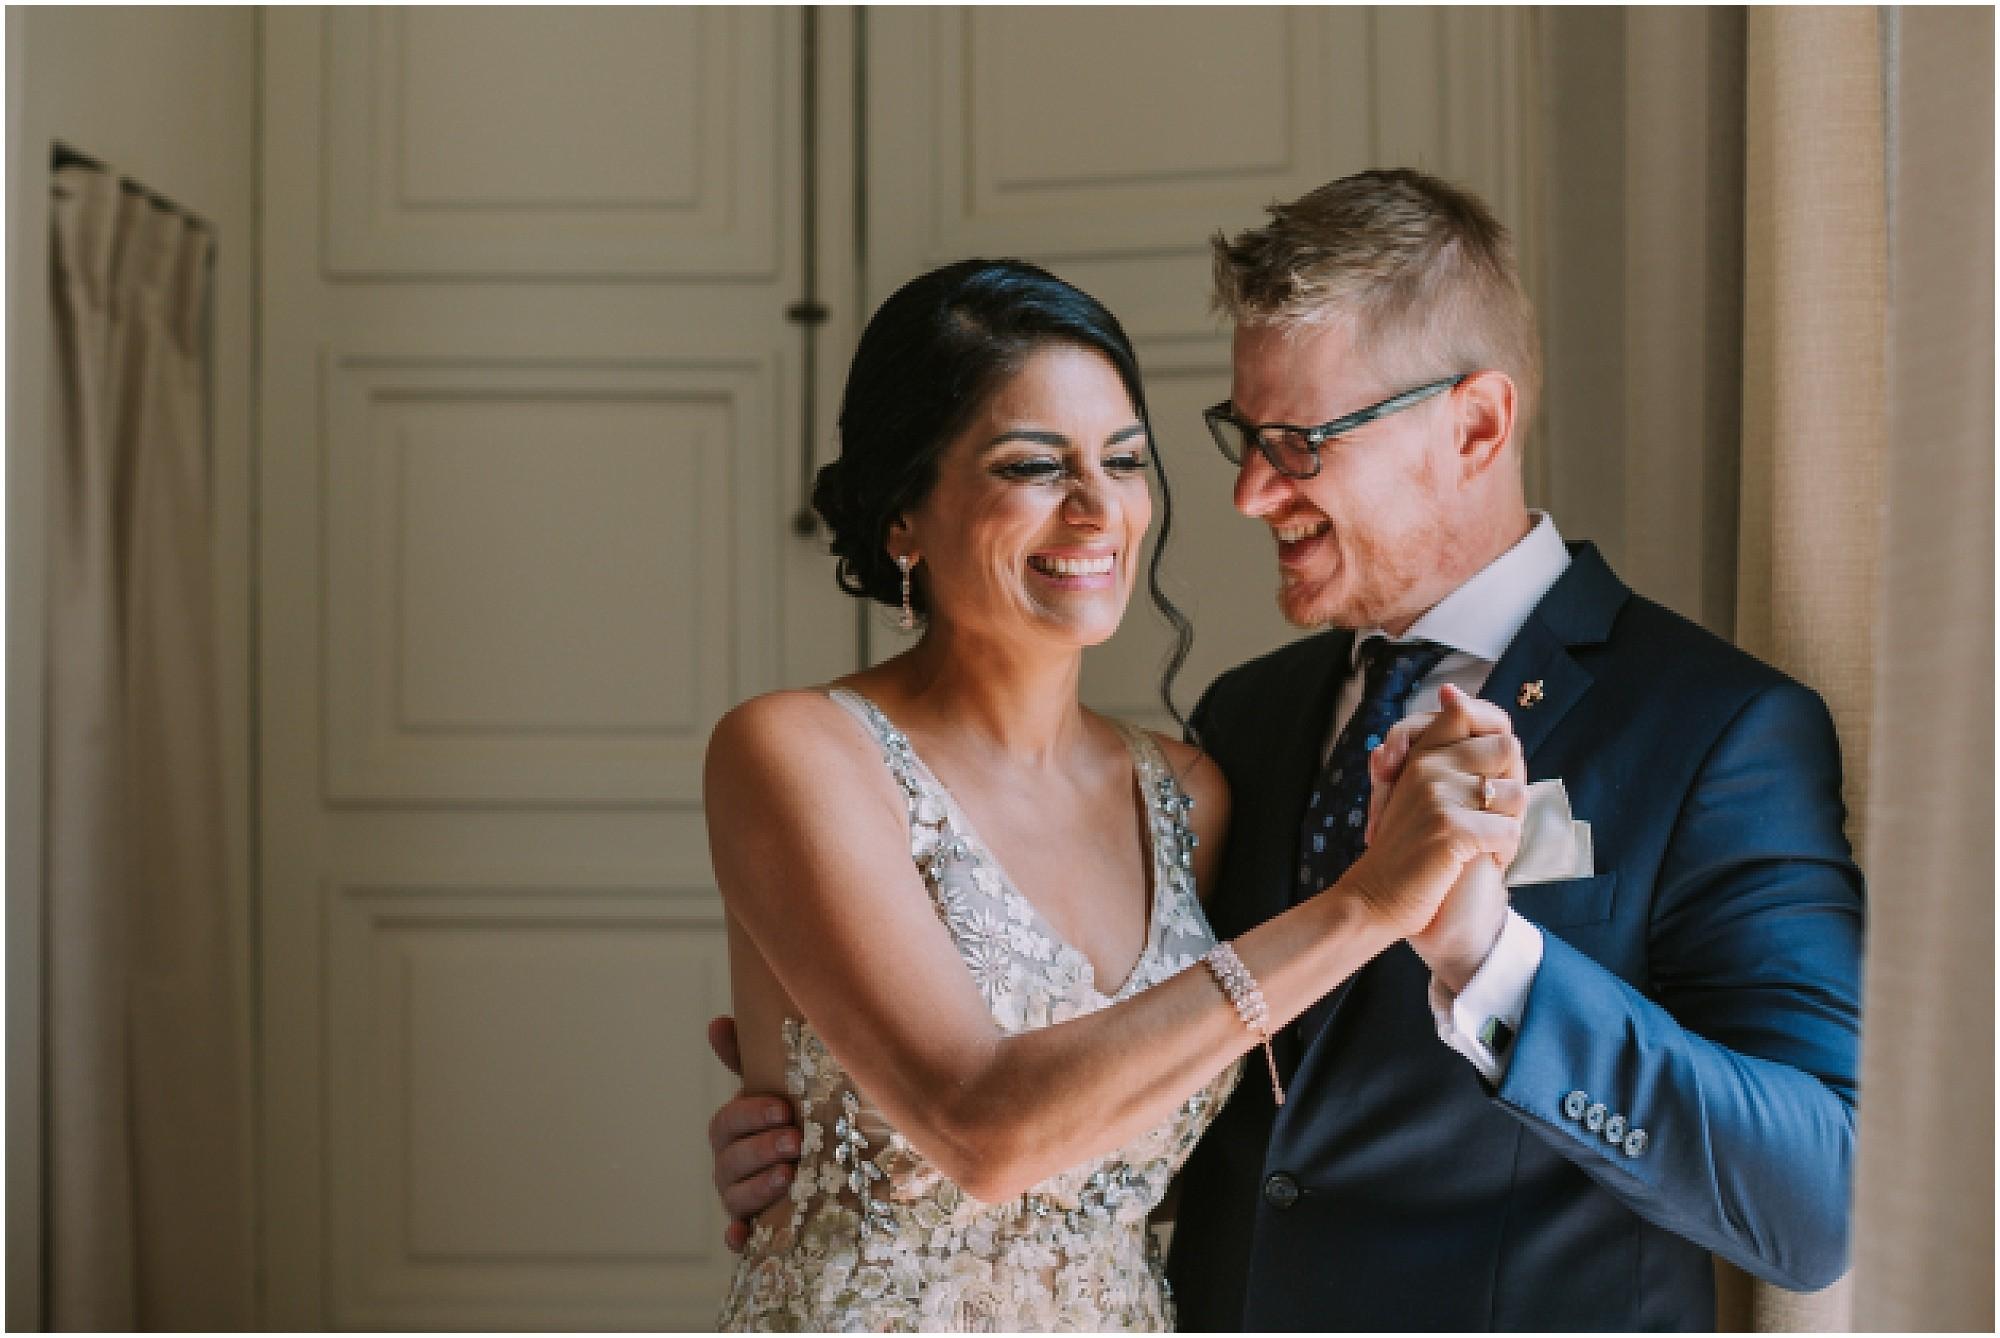 Kateryna-photos-photographer-mariage-chateau-saint-paterne-alencon-normandie-mayenne-le-mans_0019.jpg